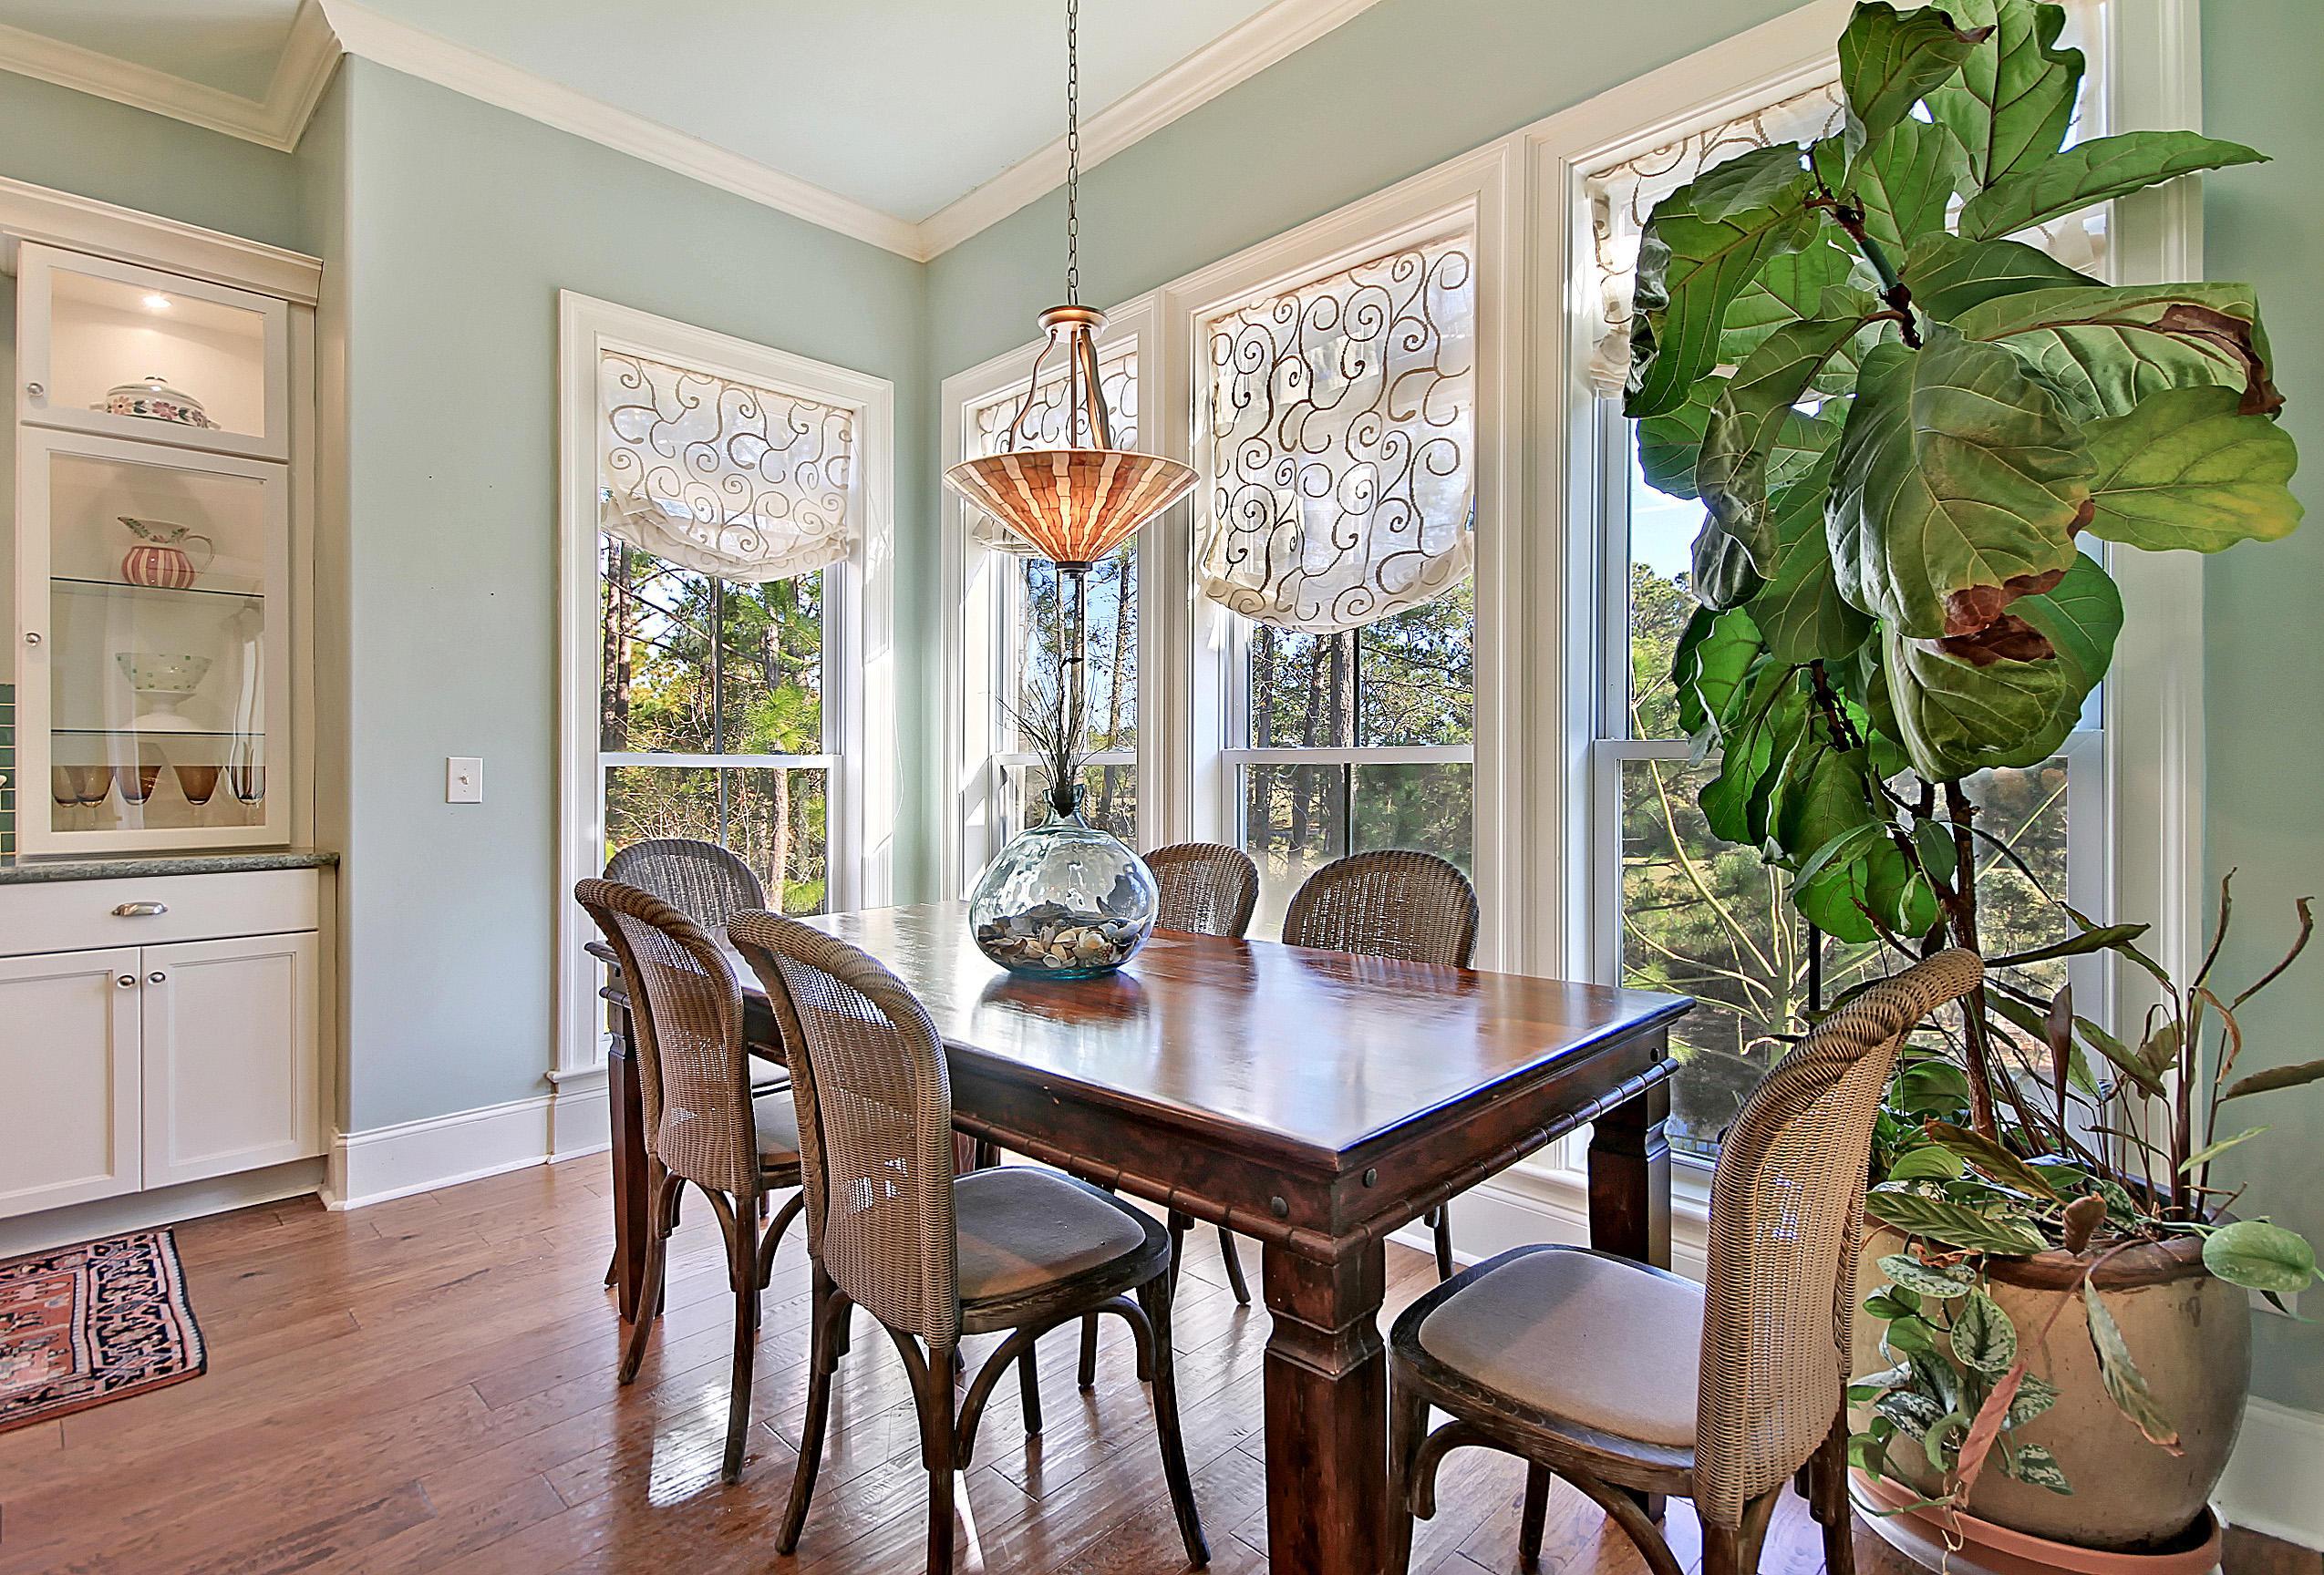 Rivertowne Country Club Homes For Sale - 2601 Kiln Creek, Mount Pleasant, SC - 63